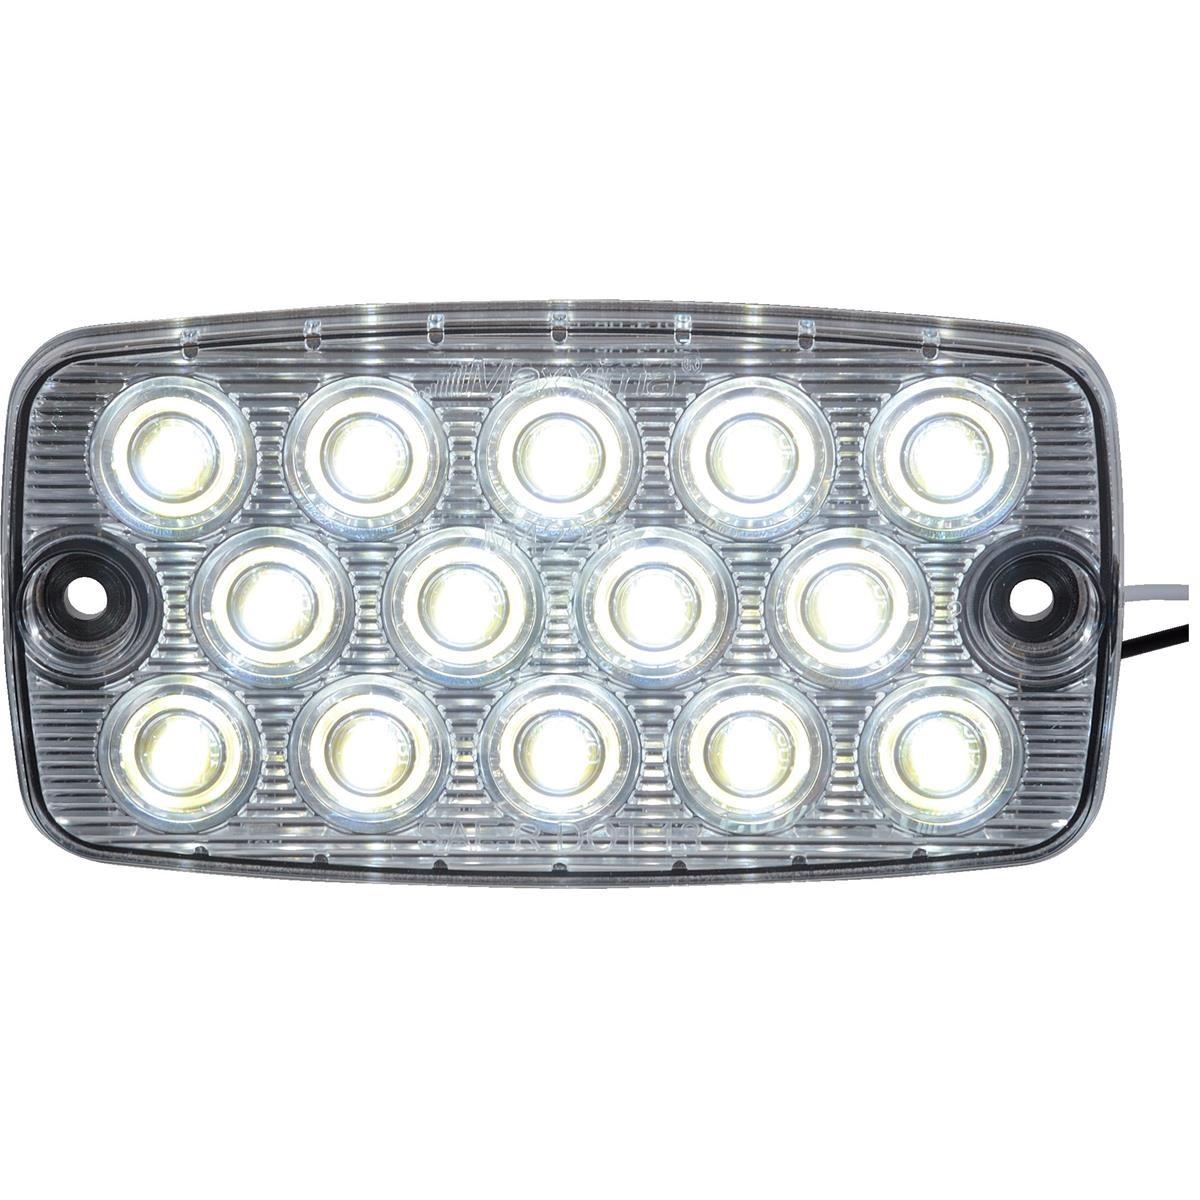 "MAXXIMA LED Low Profile Courtesy Light White 4 1 2""L x 2 1 2"